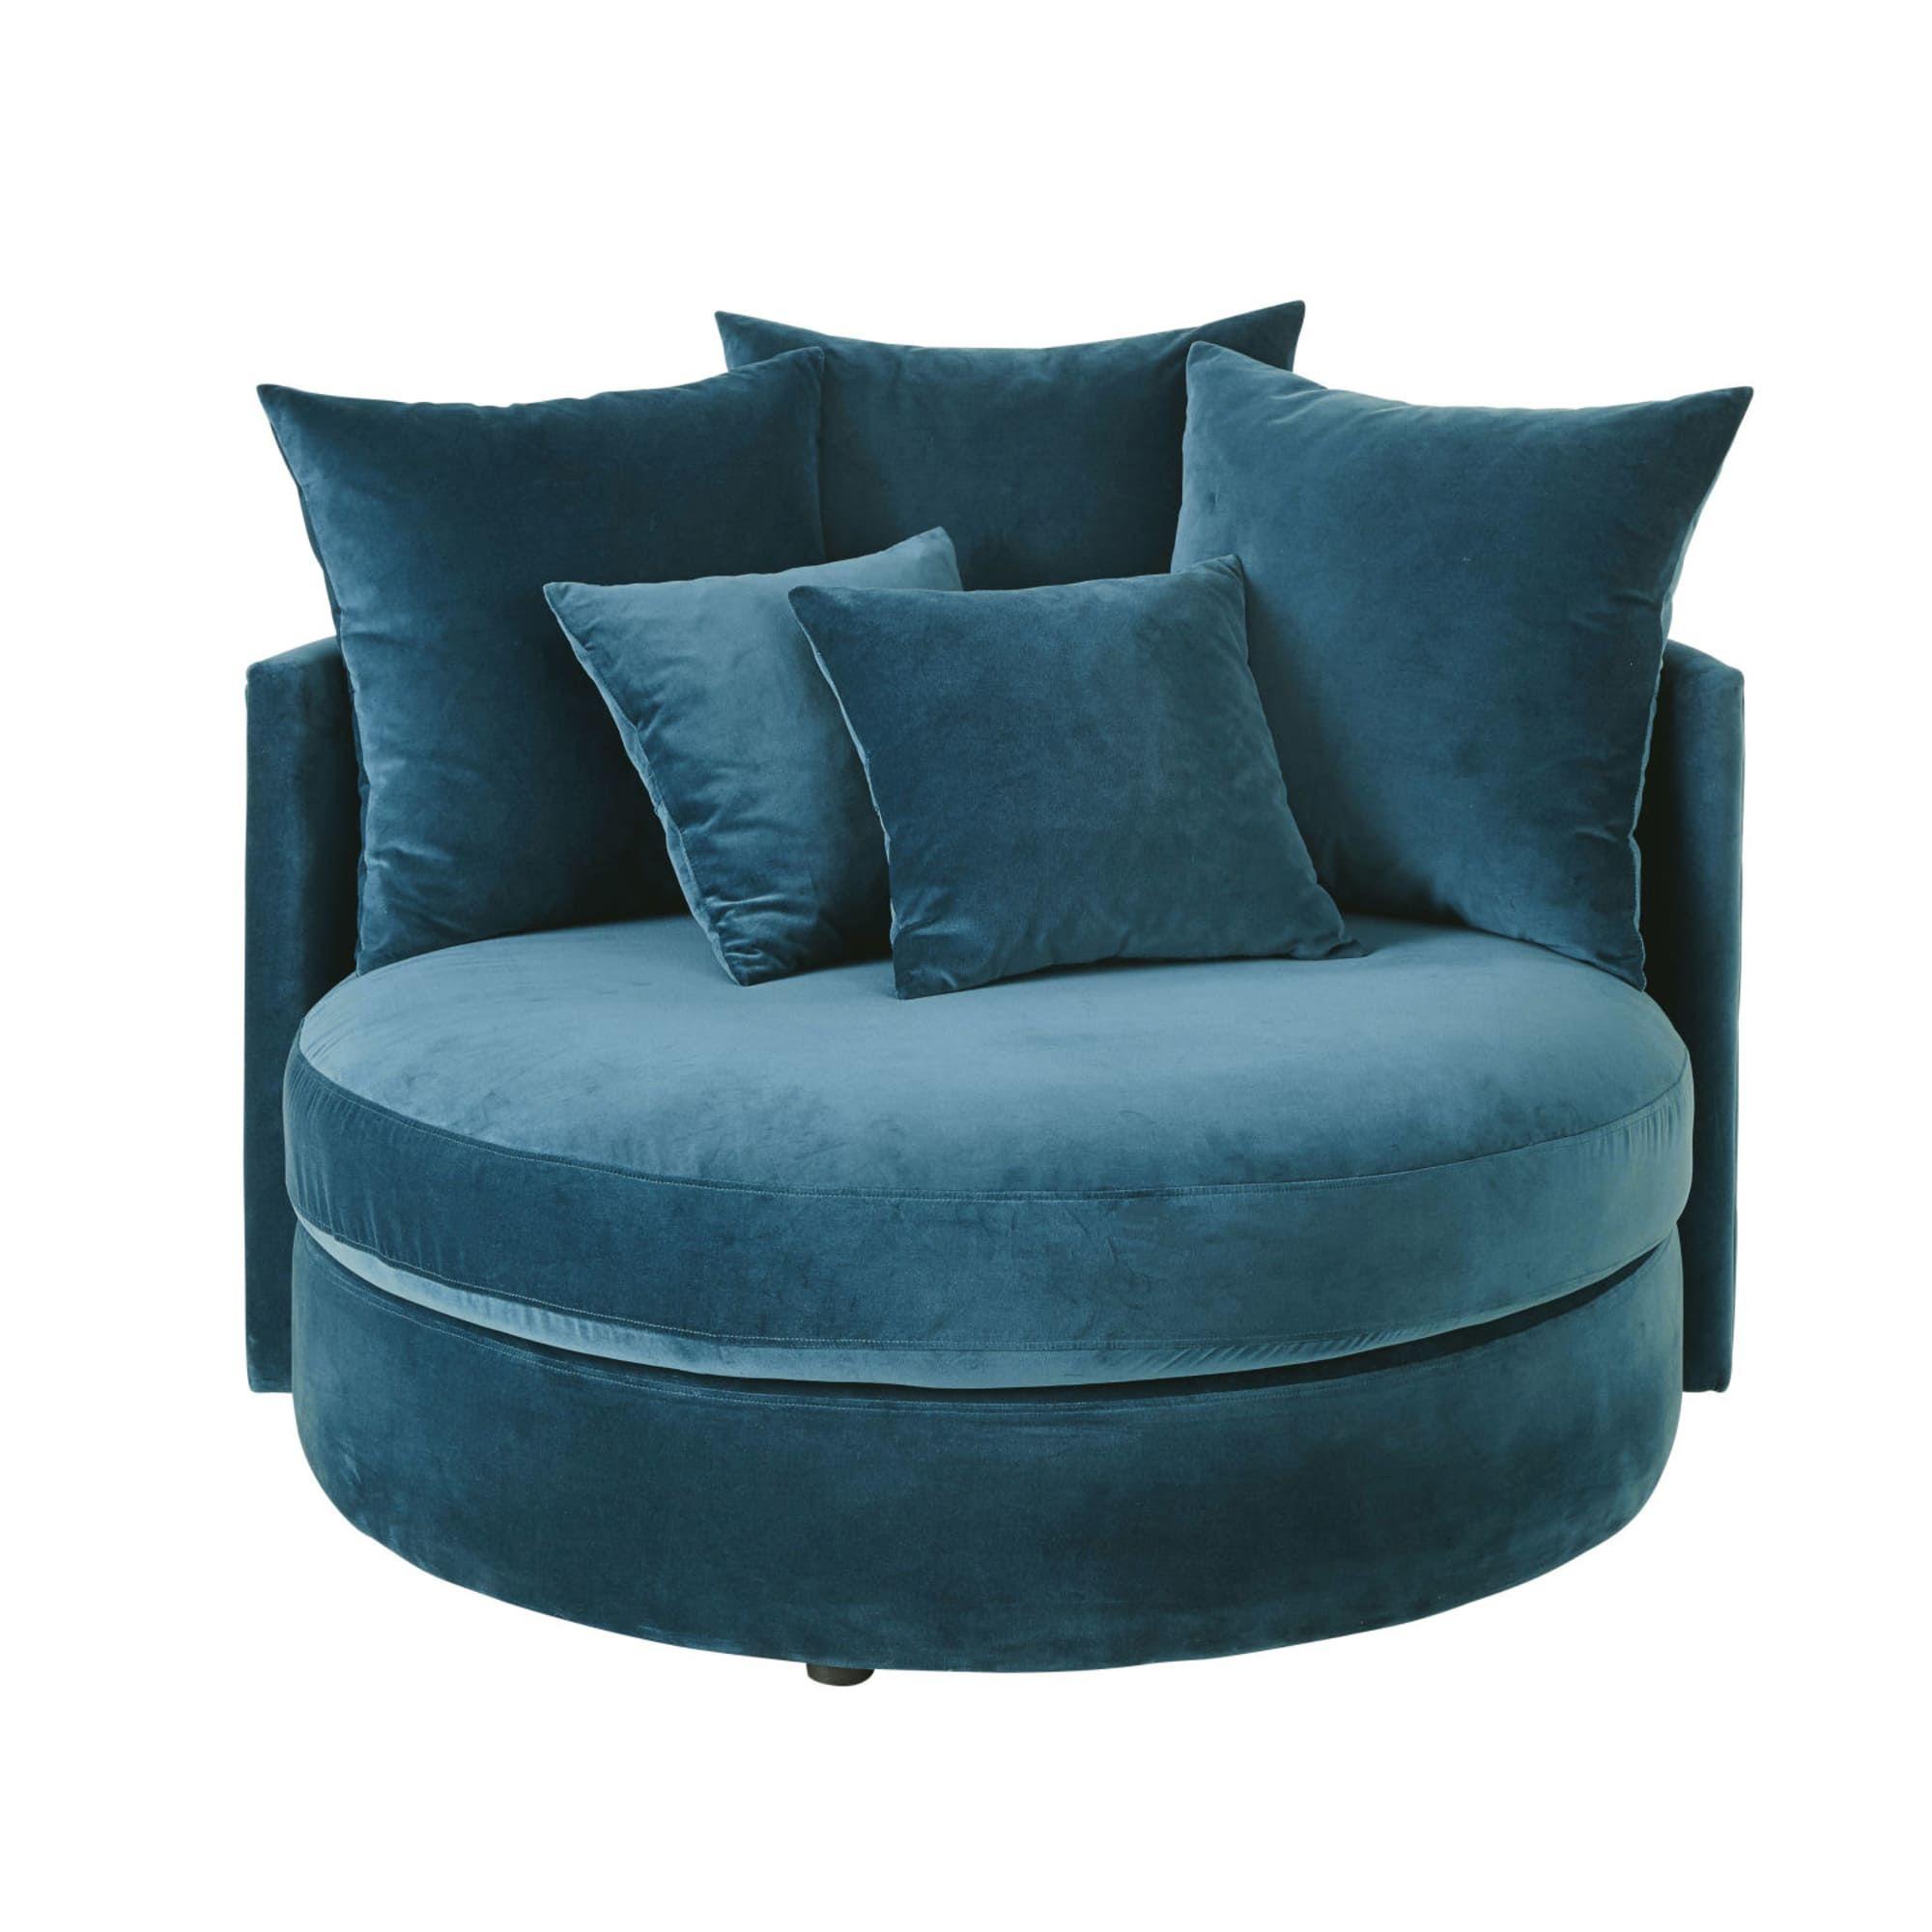 Petrol Blue 1 2 Seater Round Velvet Sofa Dita Maisons Du Monde Blue Sofa Chair Velvet Sofa Petrol Blue